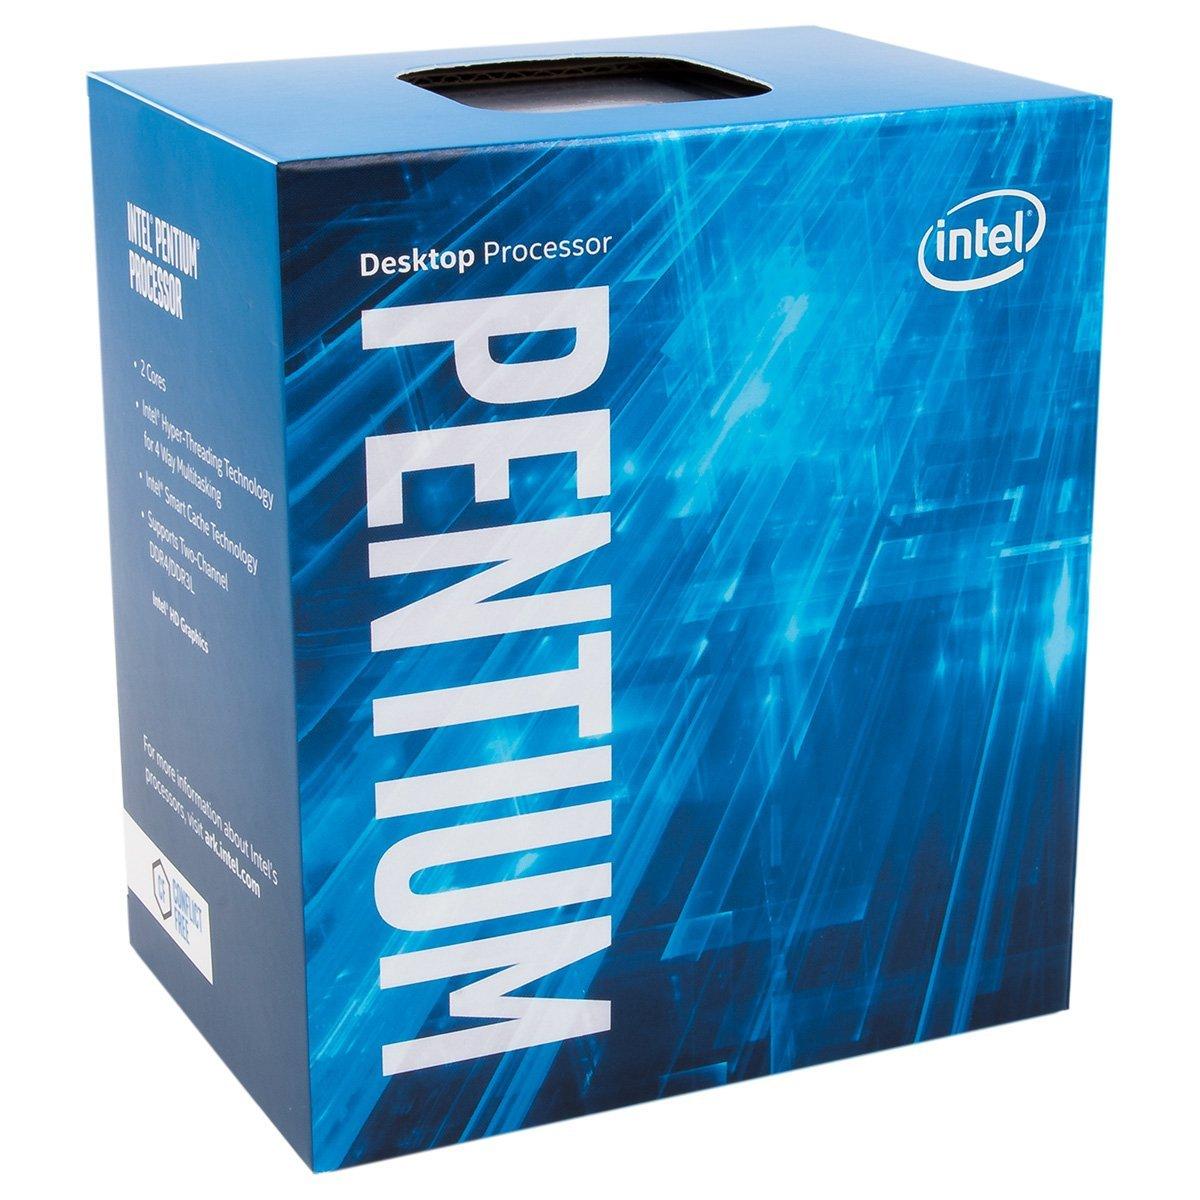 Intel Pentium Dual Core 3.6 GHz CPU G4600